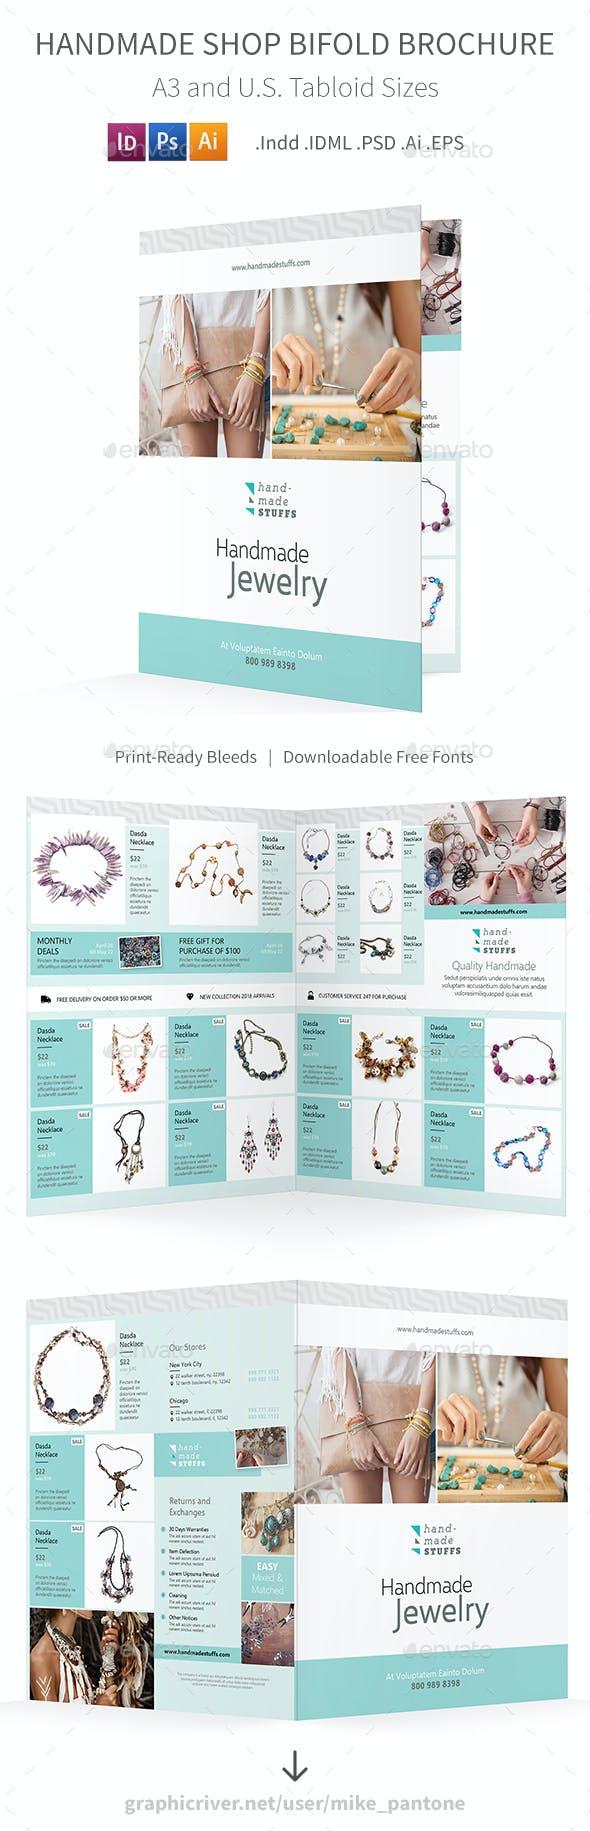 Handmade Shop Bifold / Halffold Brochure